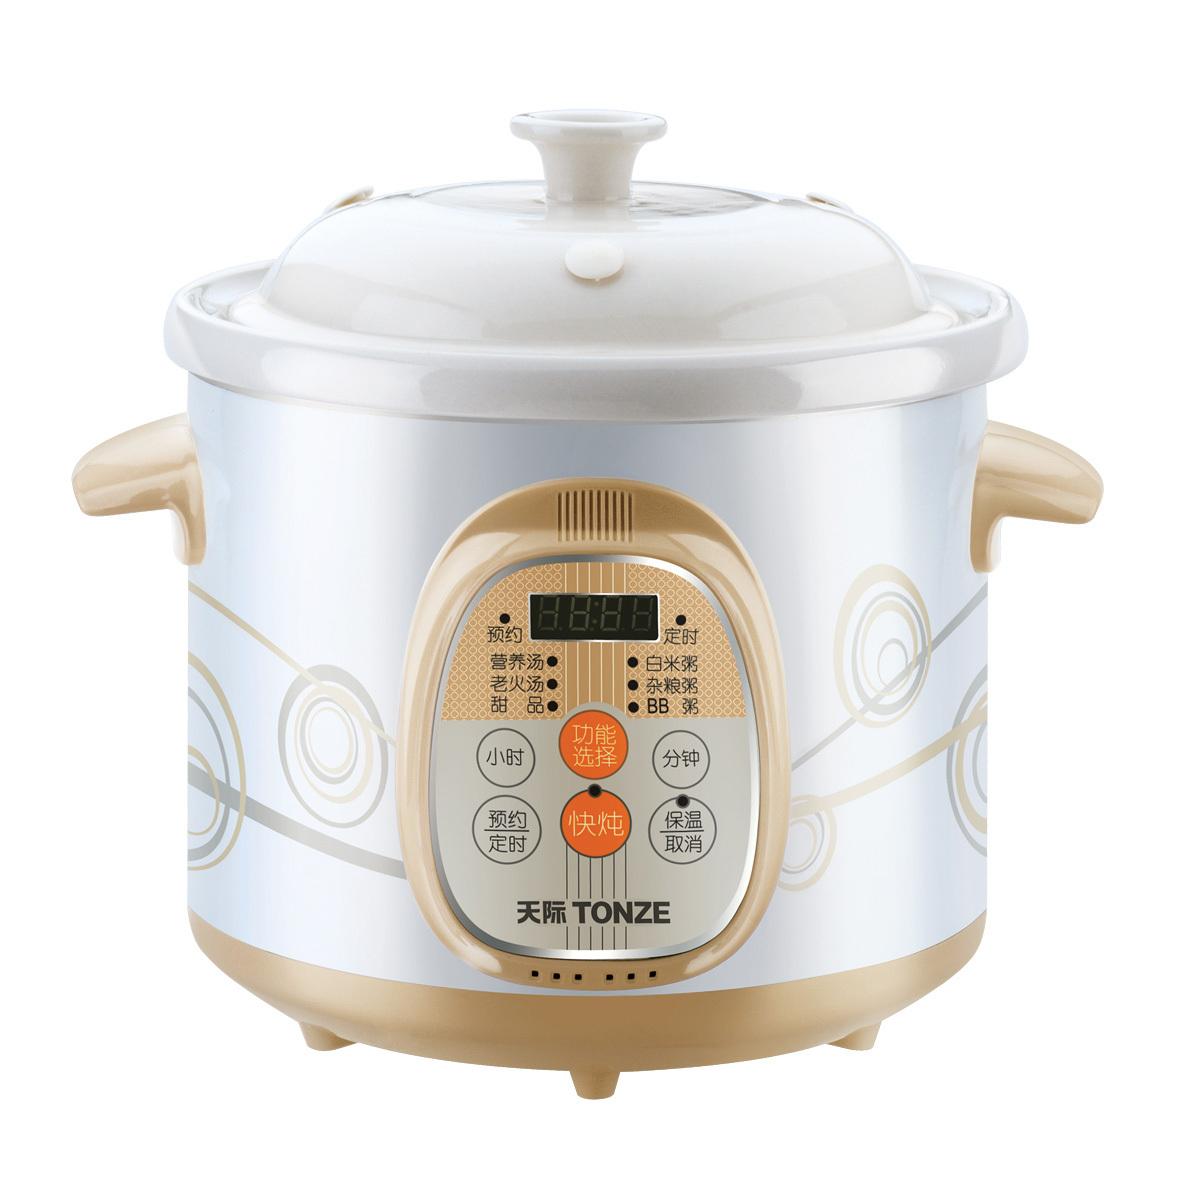 Tonze/天际 DGD20-20AWD 电炖锅好不好,怎么样,值得买吗